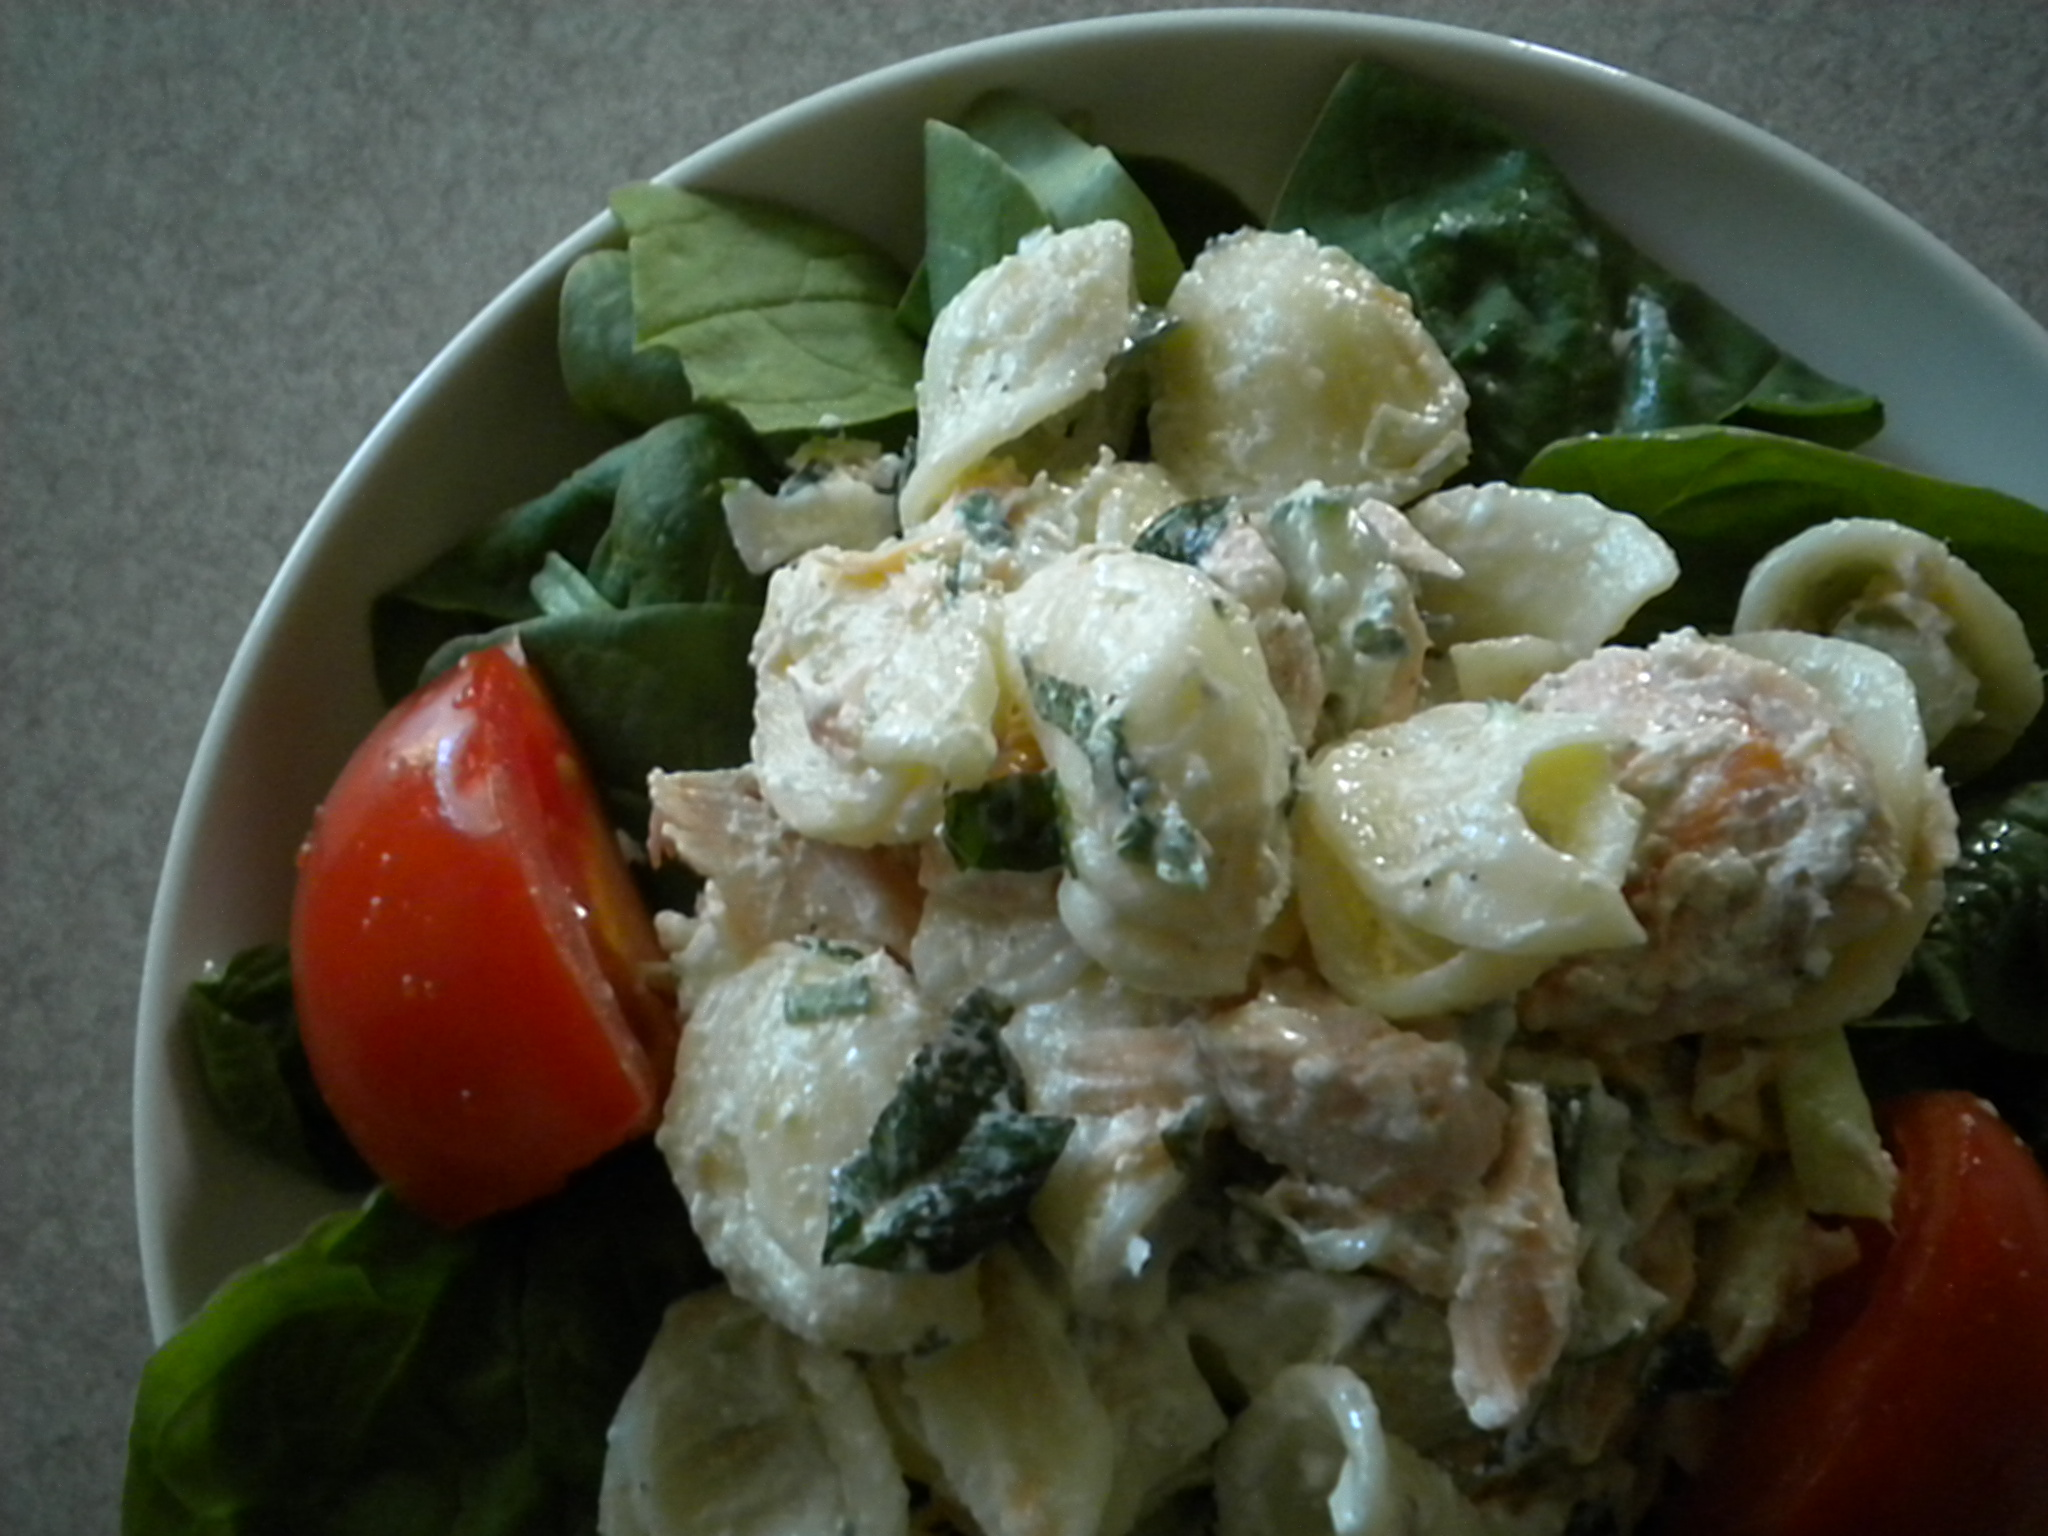 Creamy Minted Salmon Pasta Salad